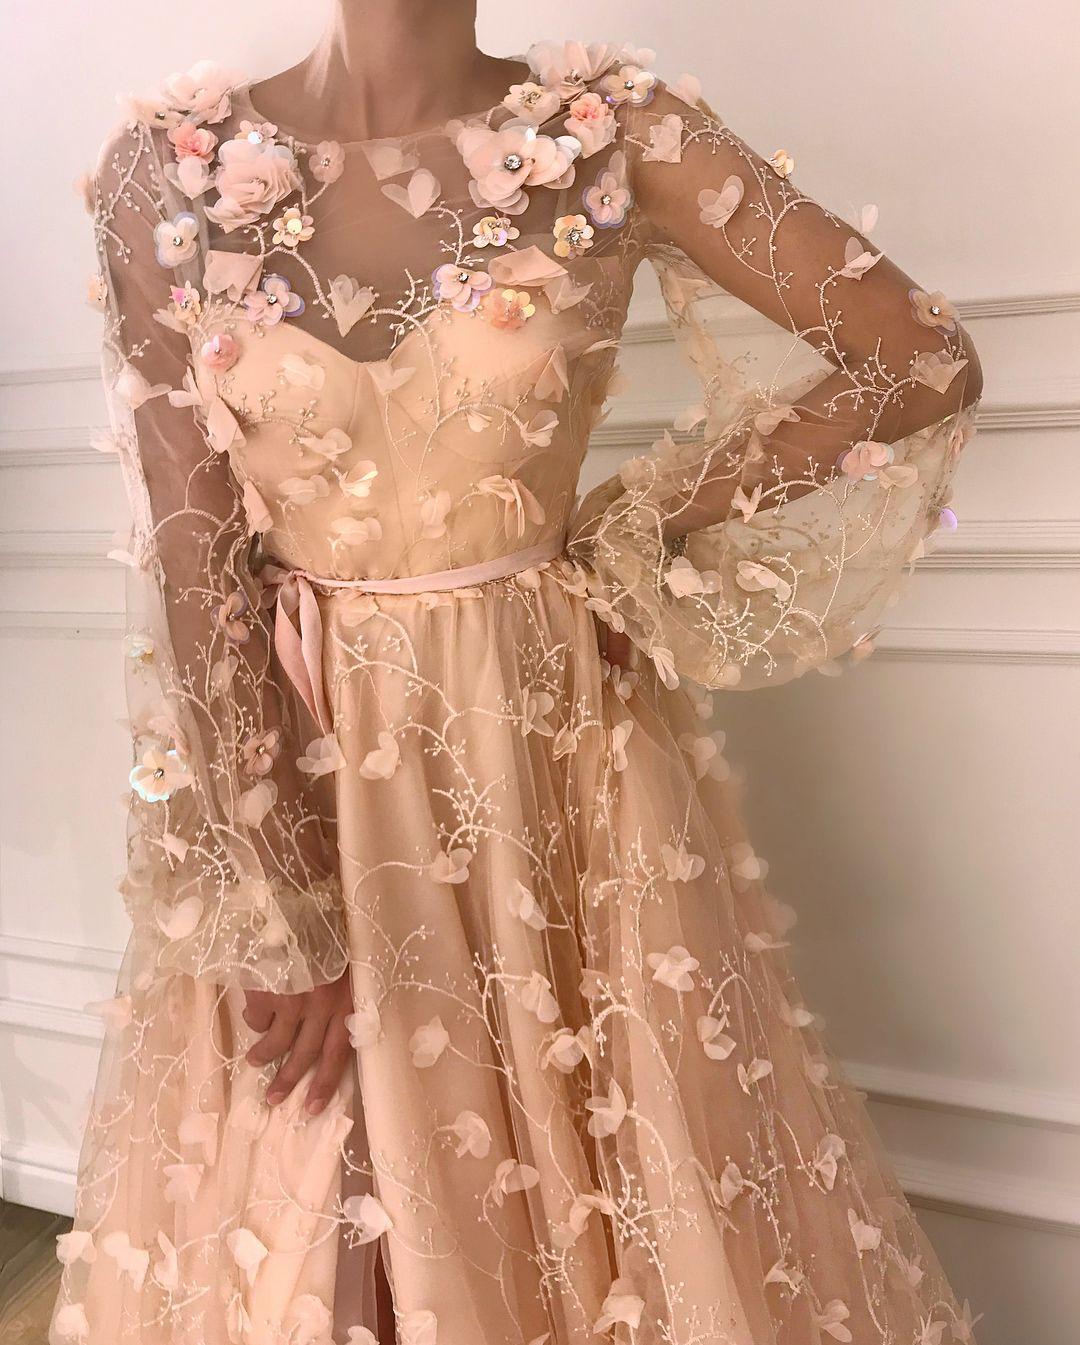 Teutamatoshiduriqi dresses pinterest prom gowns and clothes